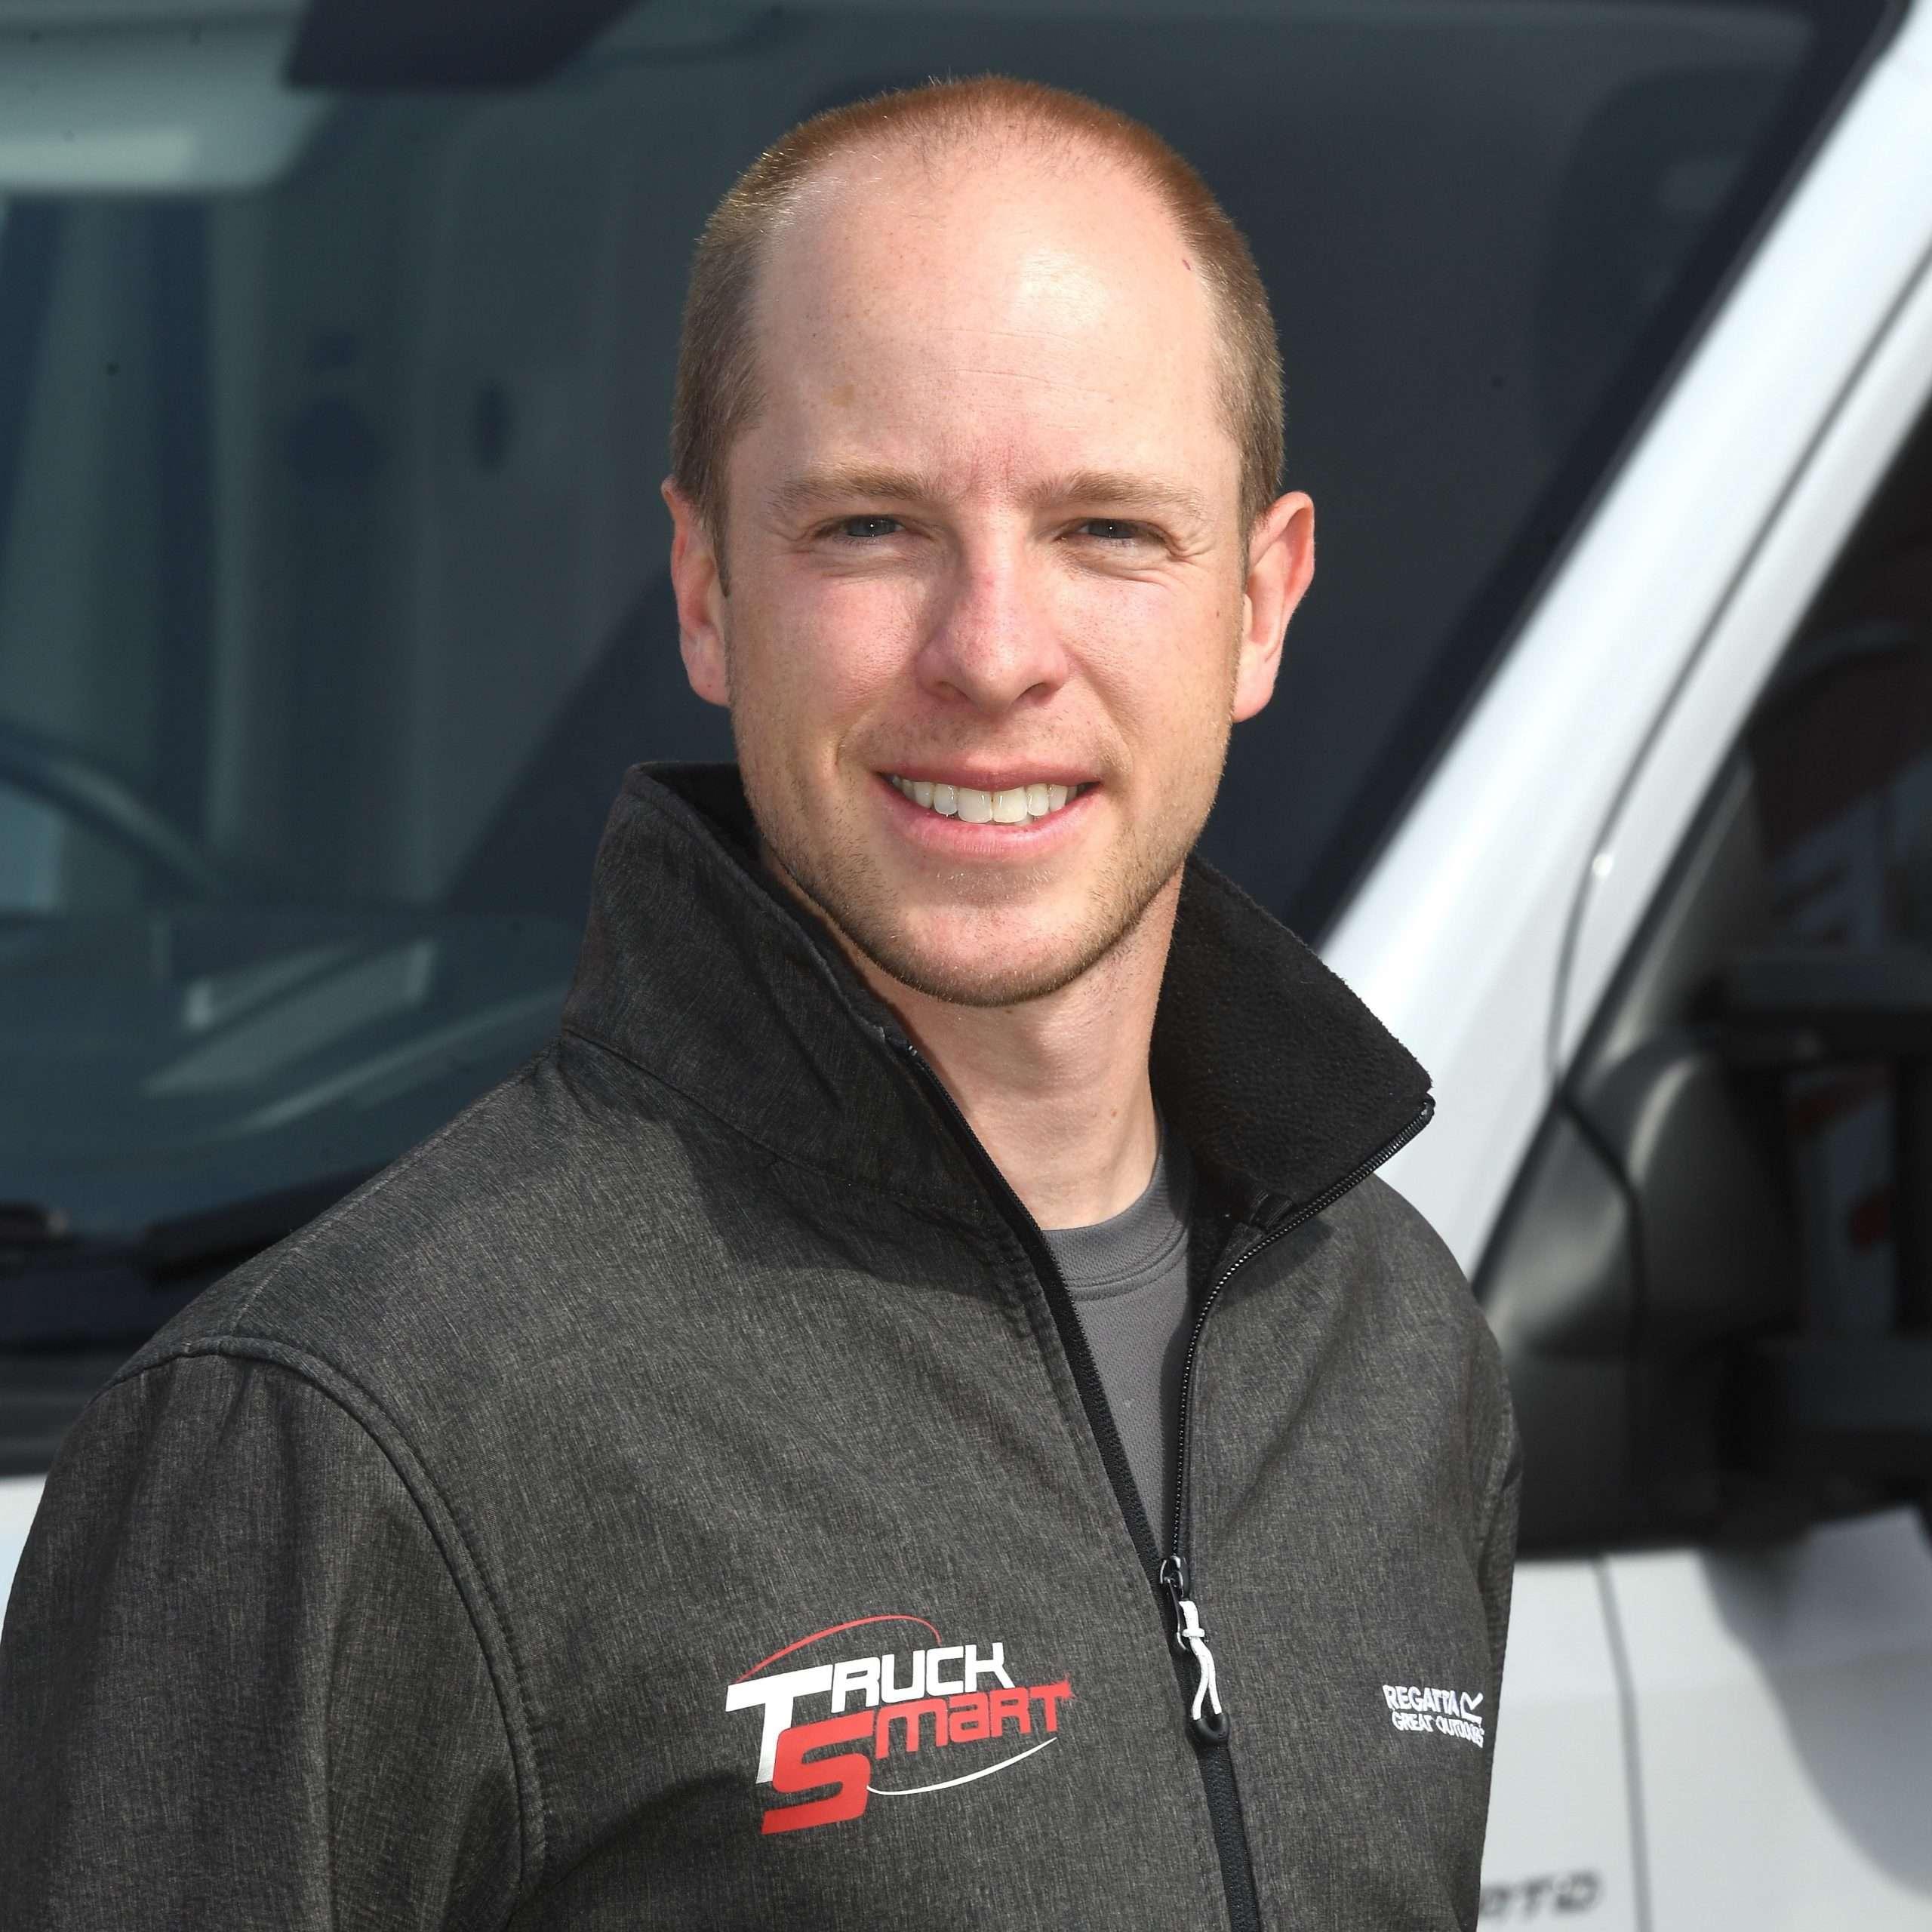 Truck Smart - Sam Neale